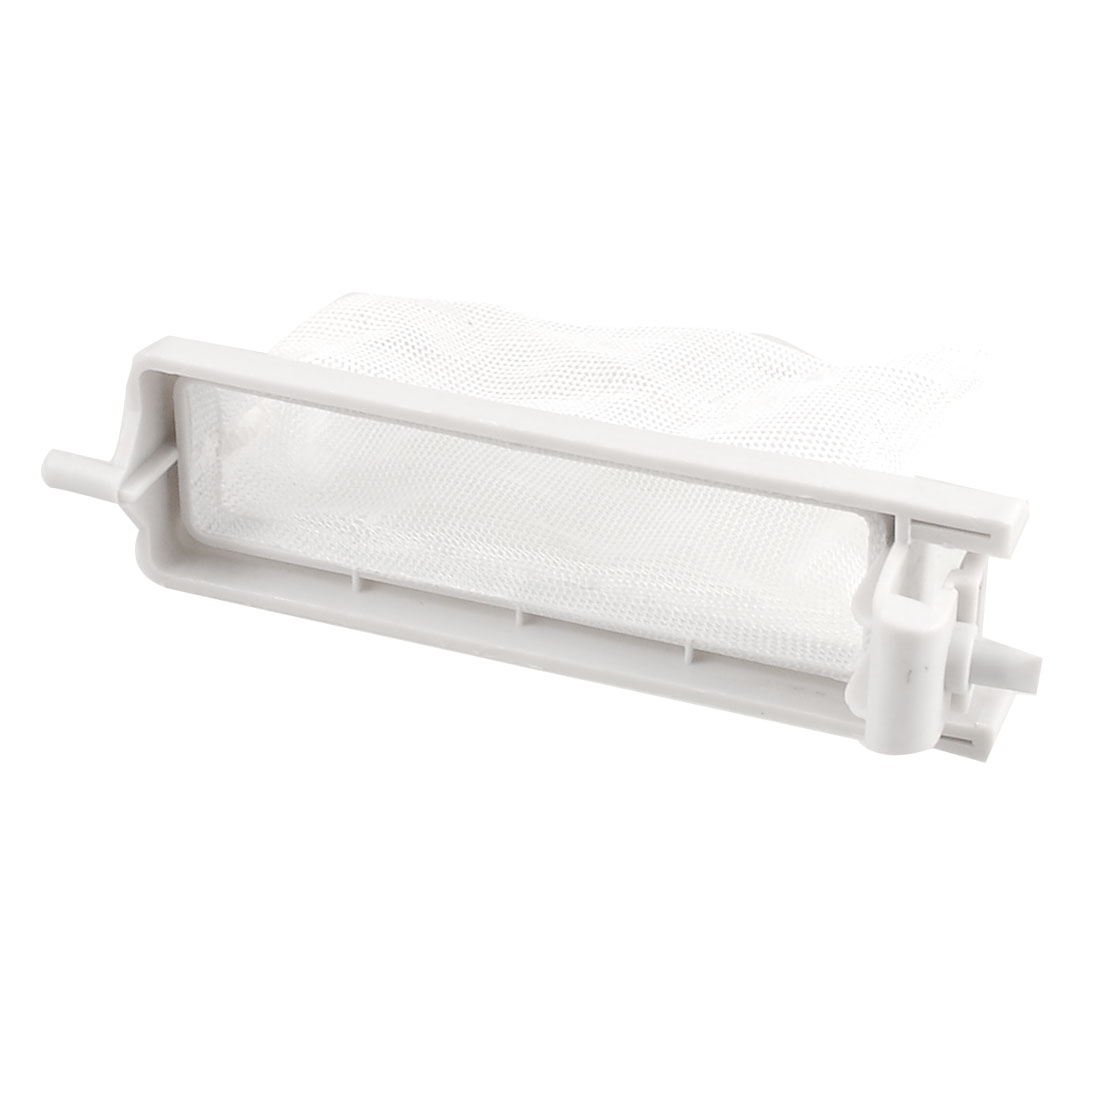 "White Plastic Nylon Filter Bag Spare Part 4"" x 2.4"" Mesh for Washing Machine"